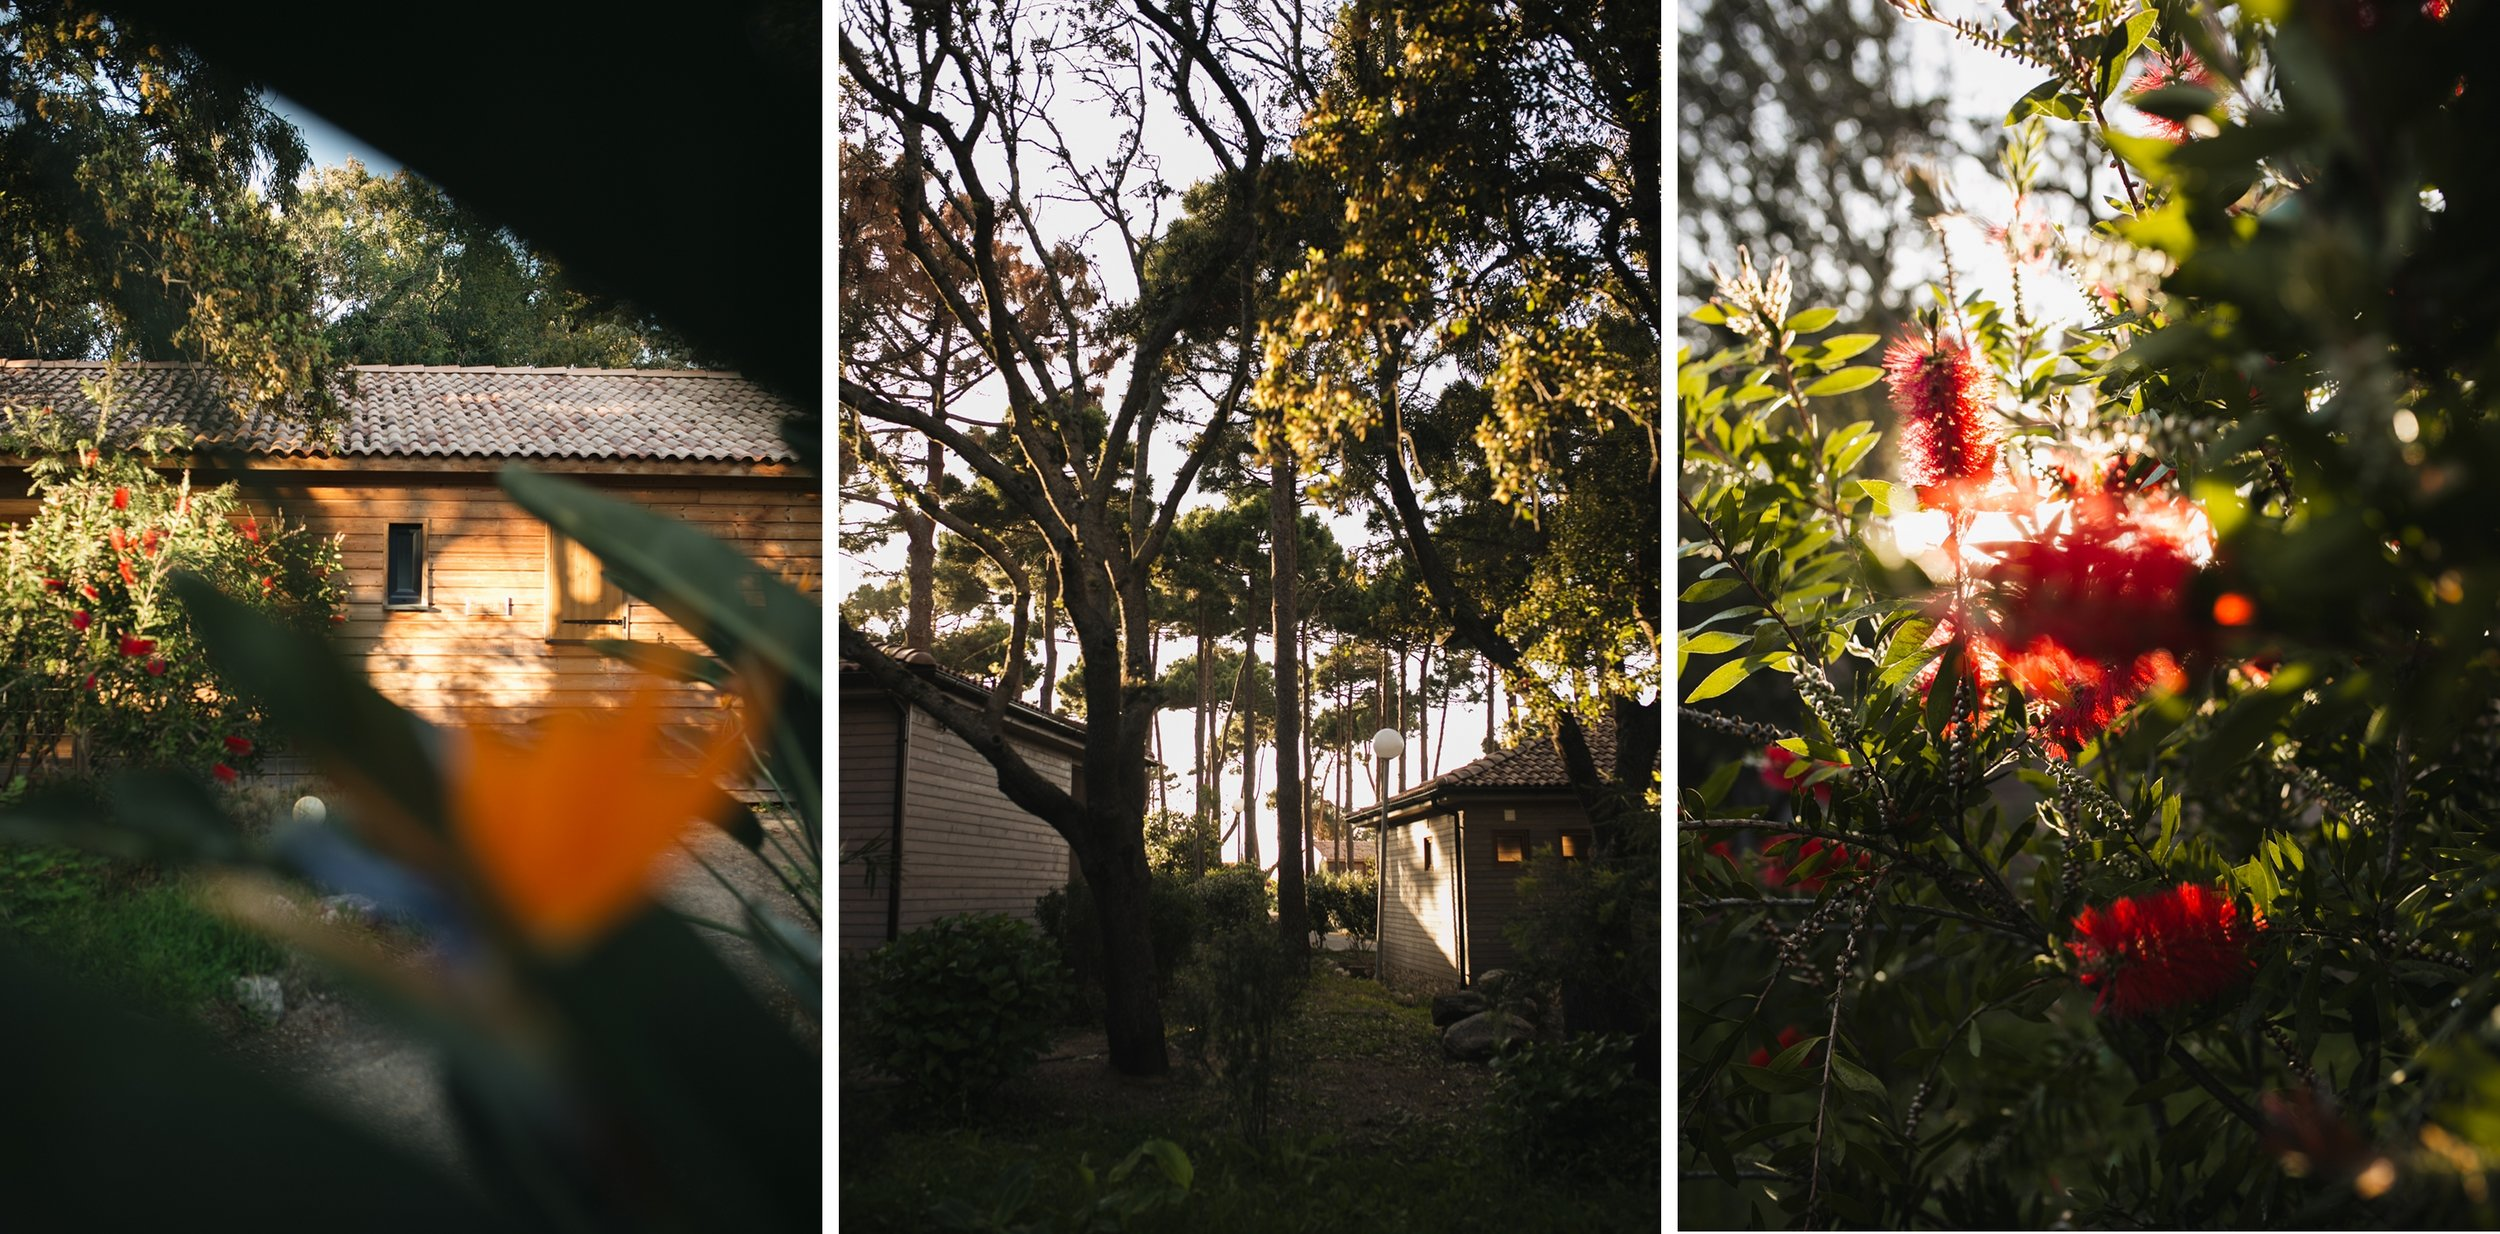 U-Livanti-coucher-de-soleil-propriano-belvedere-campomoro.jpg